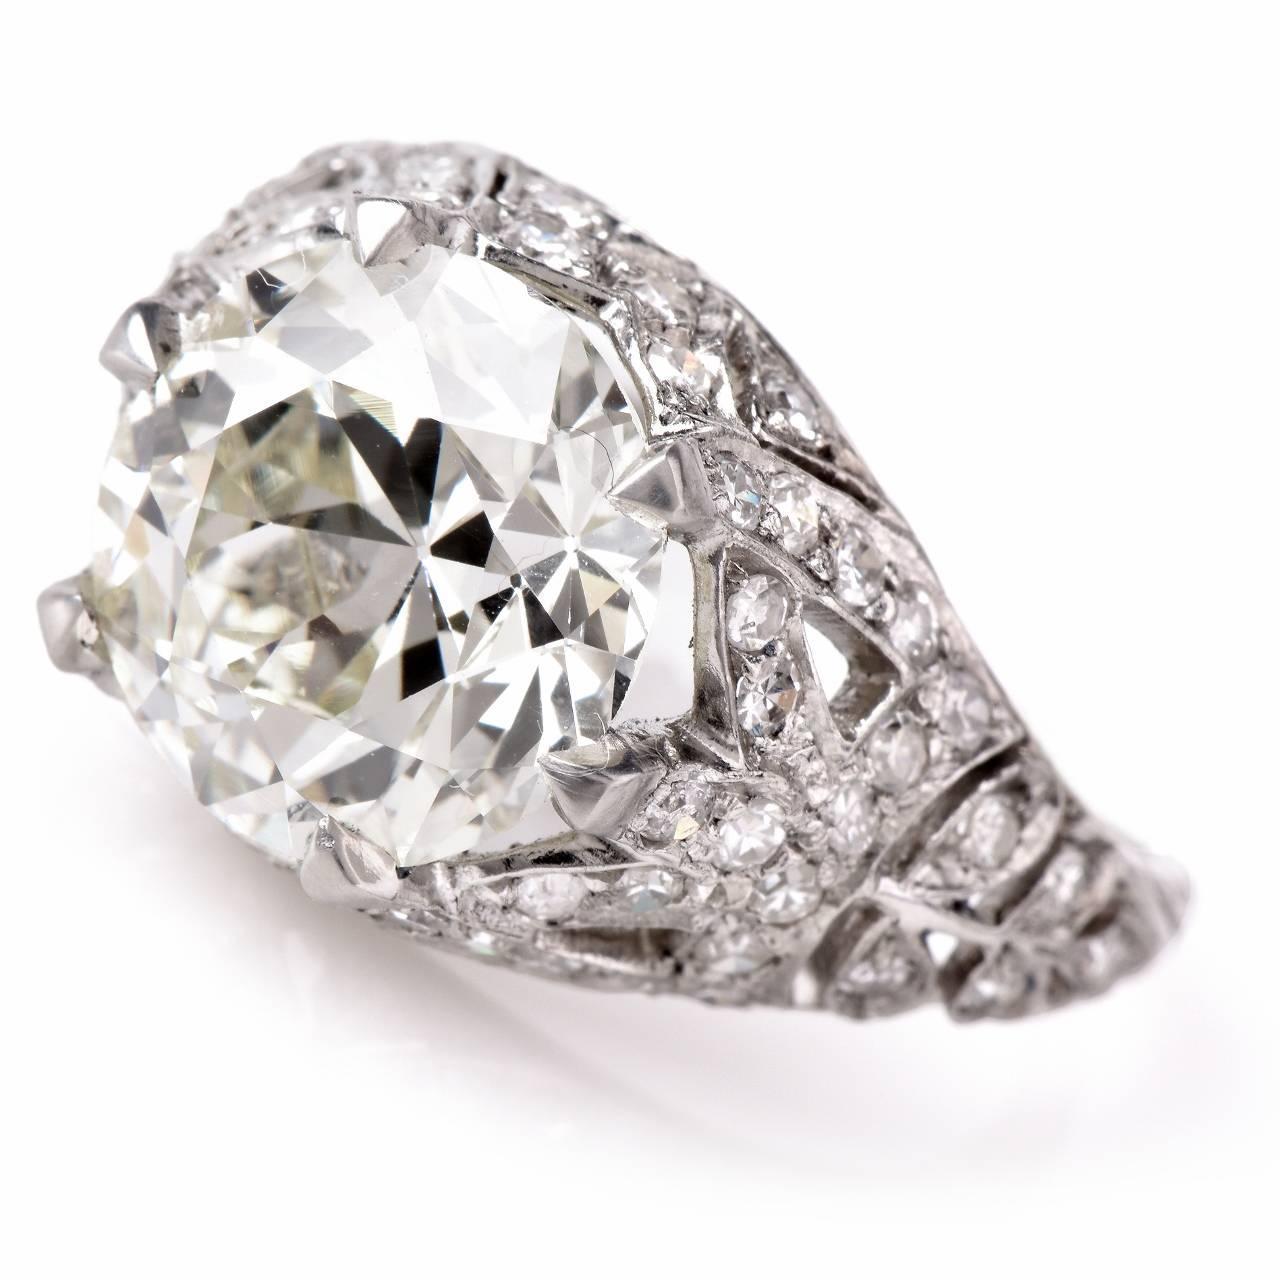 Antique 3 98 Carat Diamond Platinum Filigree Engagement Ring at 1stdibs